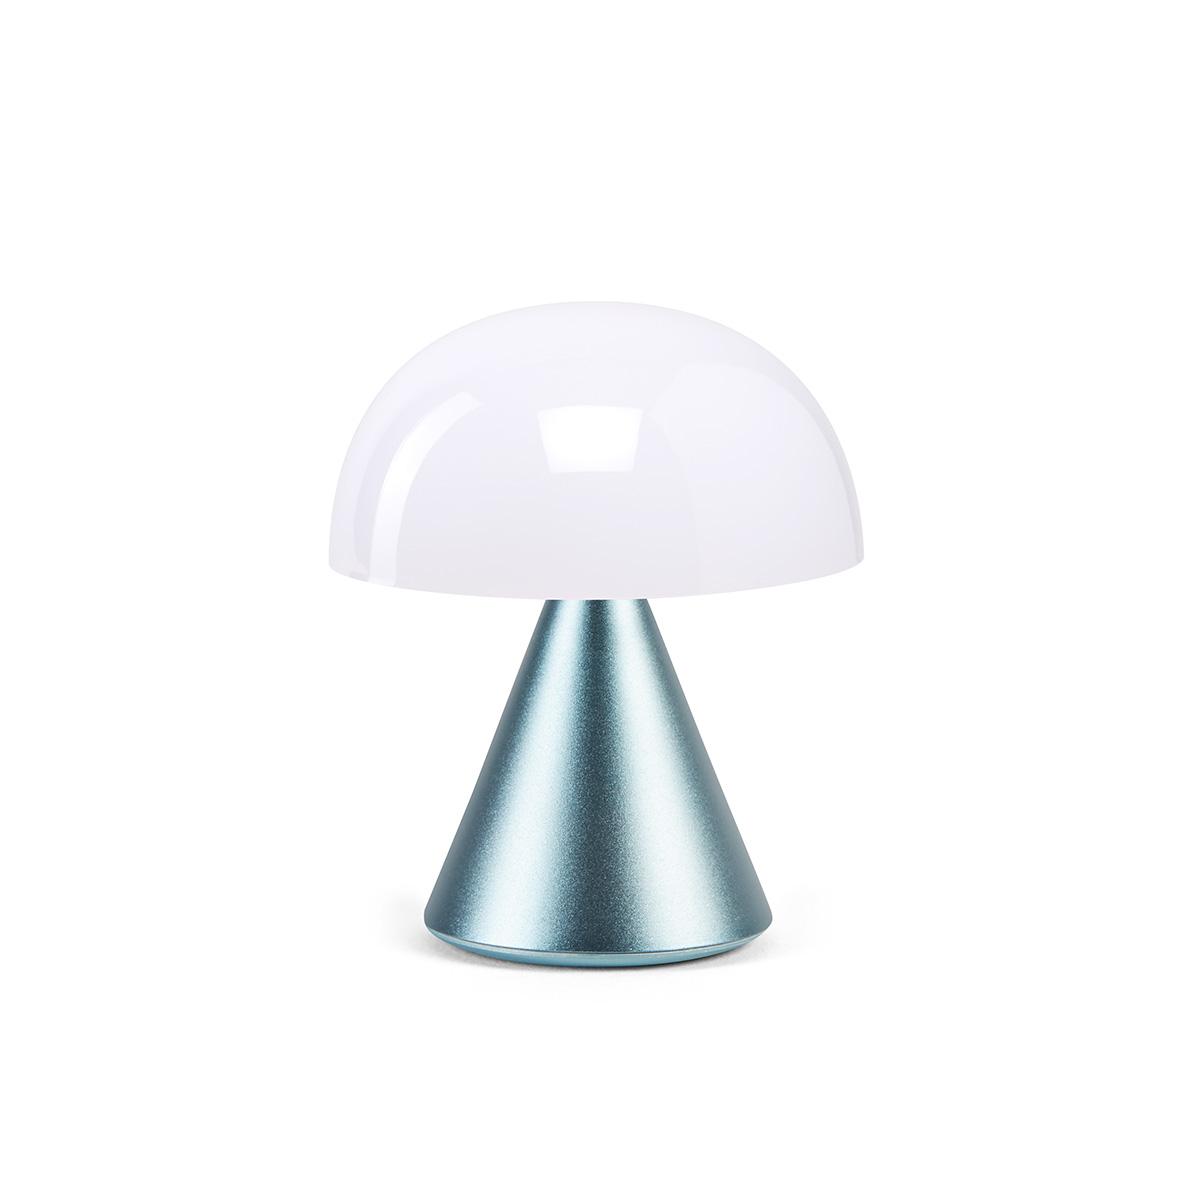 MINA Mini- LED-Lampe von Lexon hellblau poliert